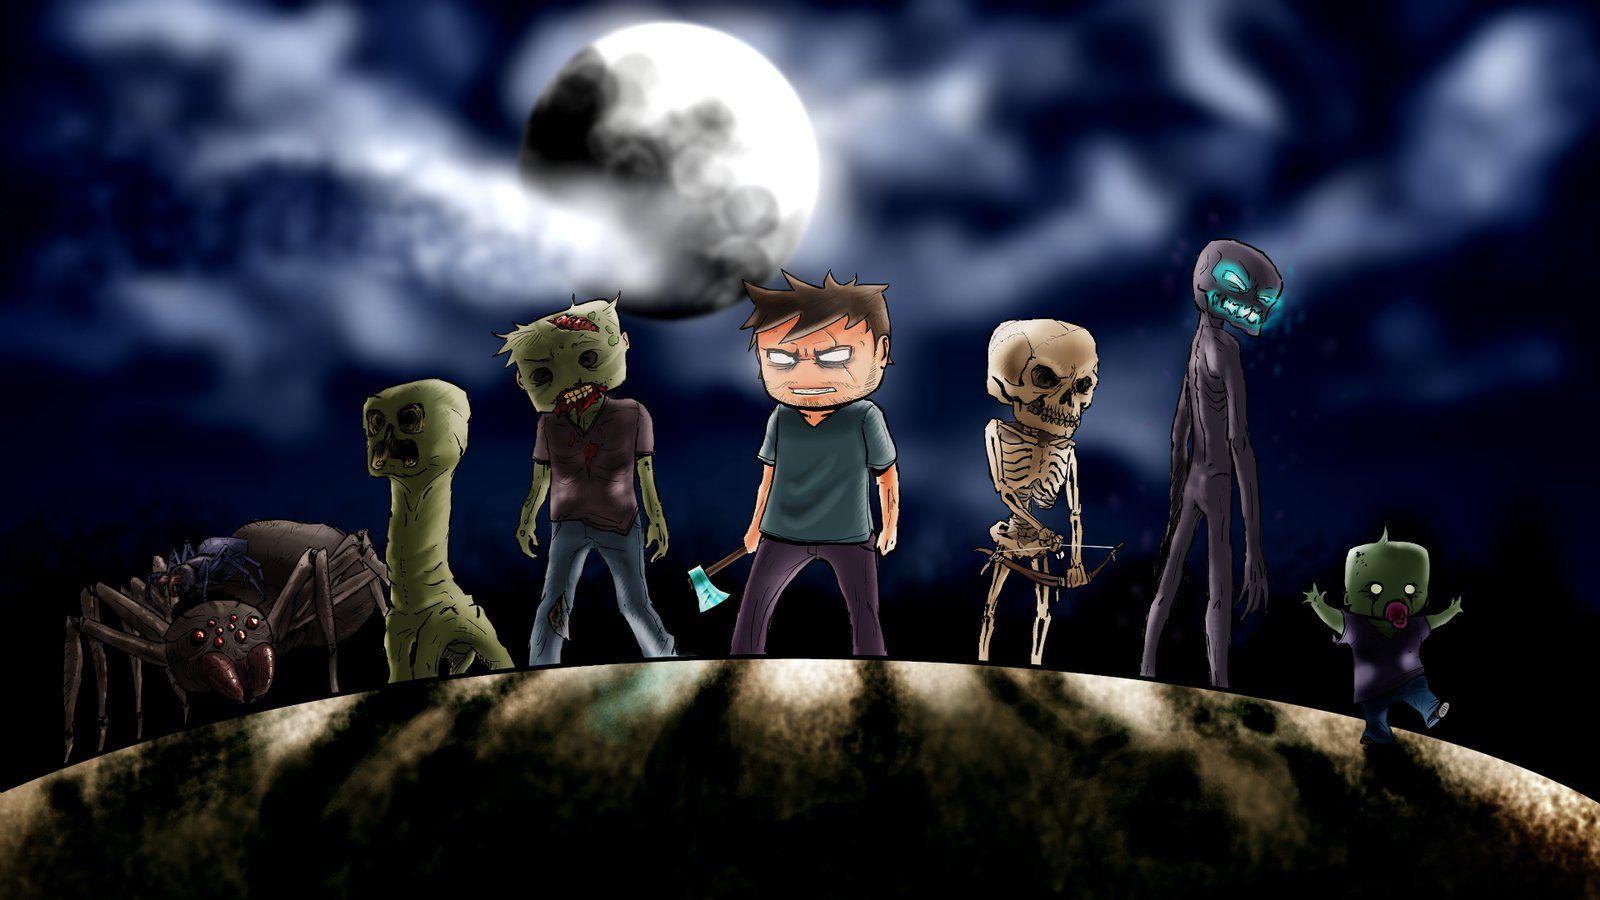 minecraft halloween Google Search Minecraft fan art